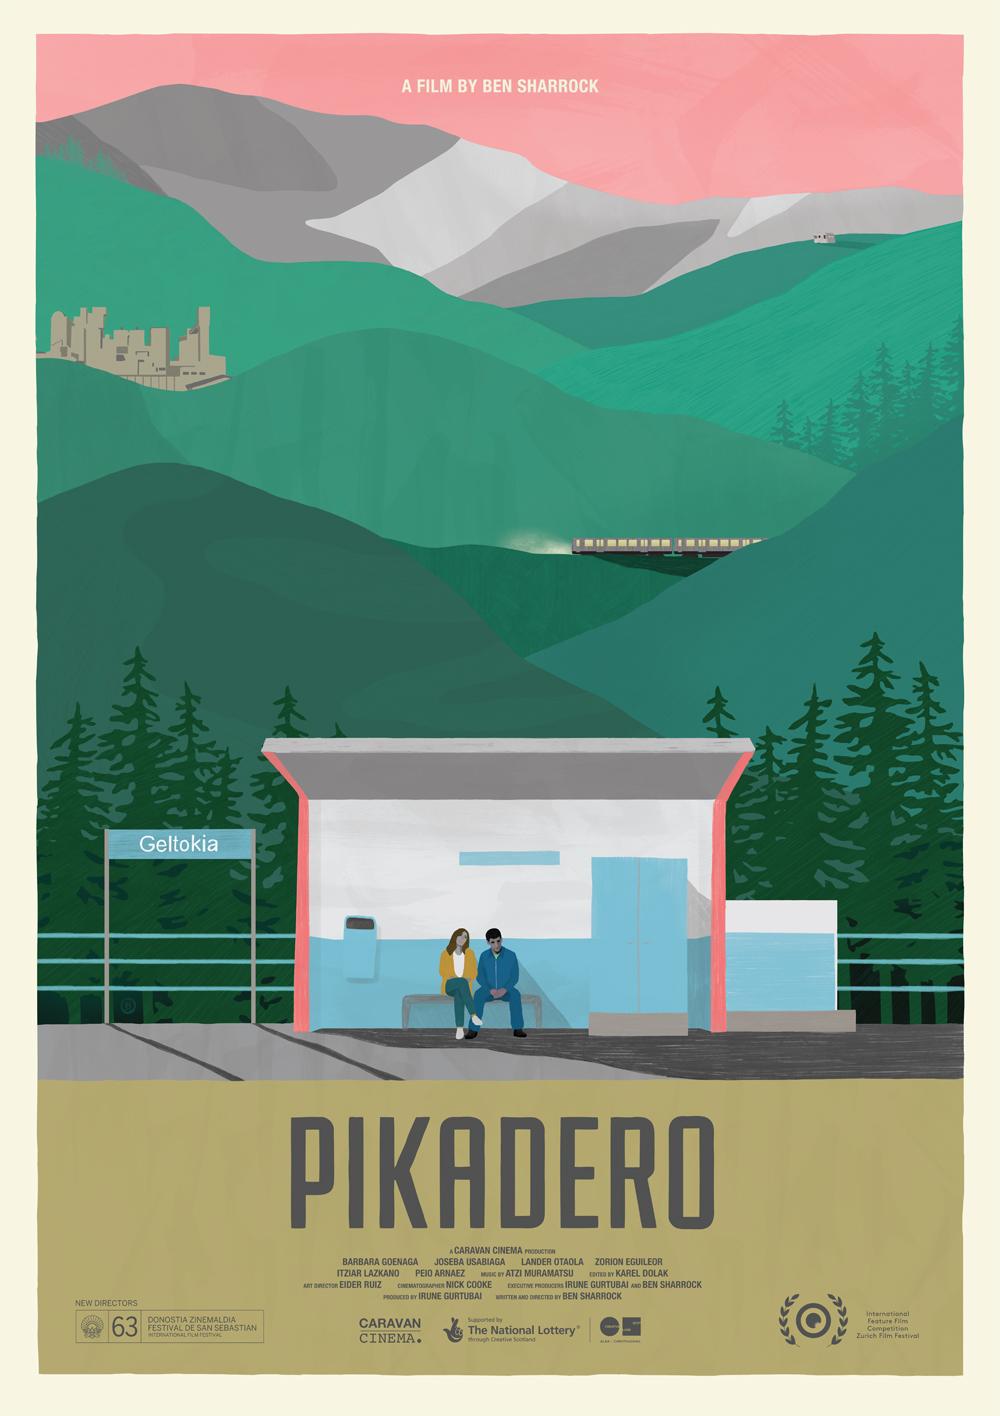 Pikadero-poster_web